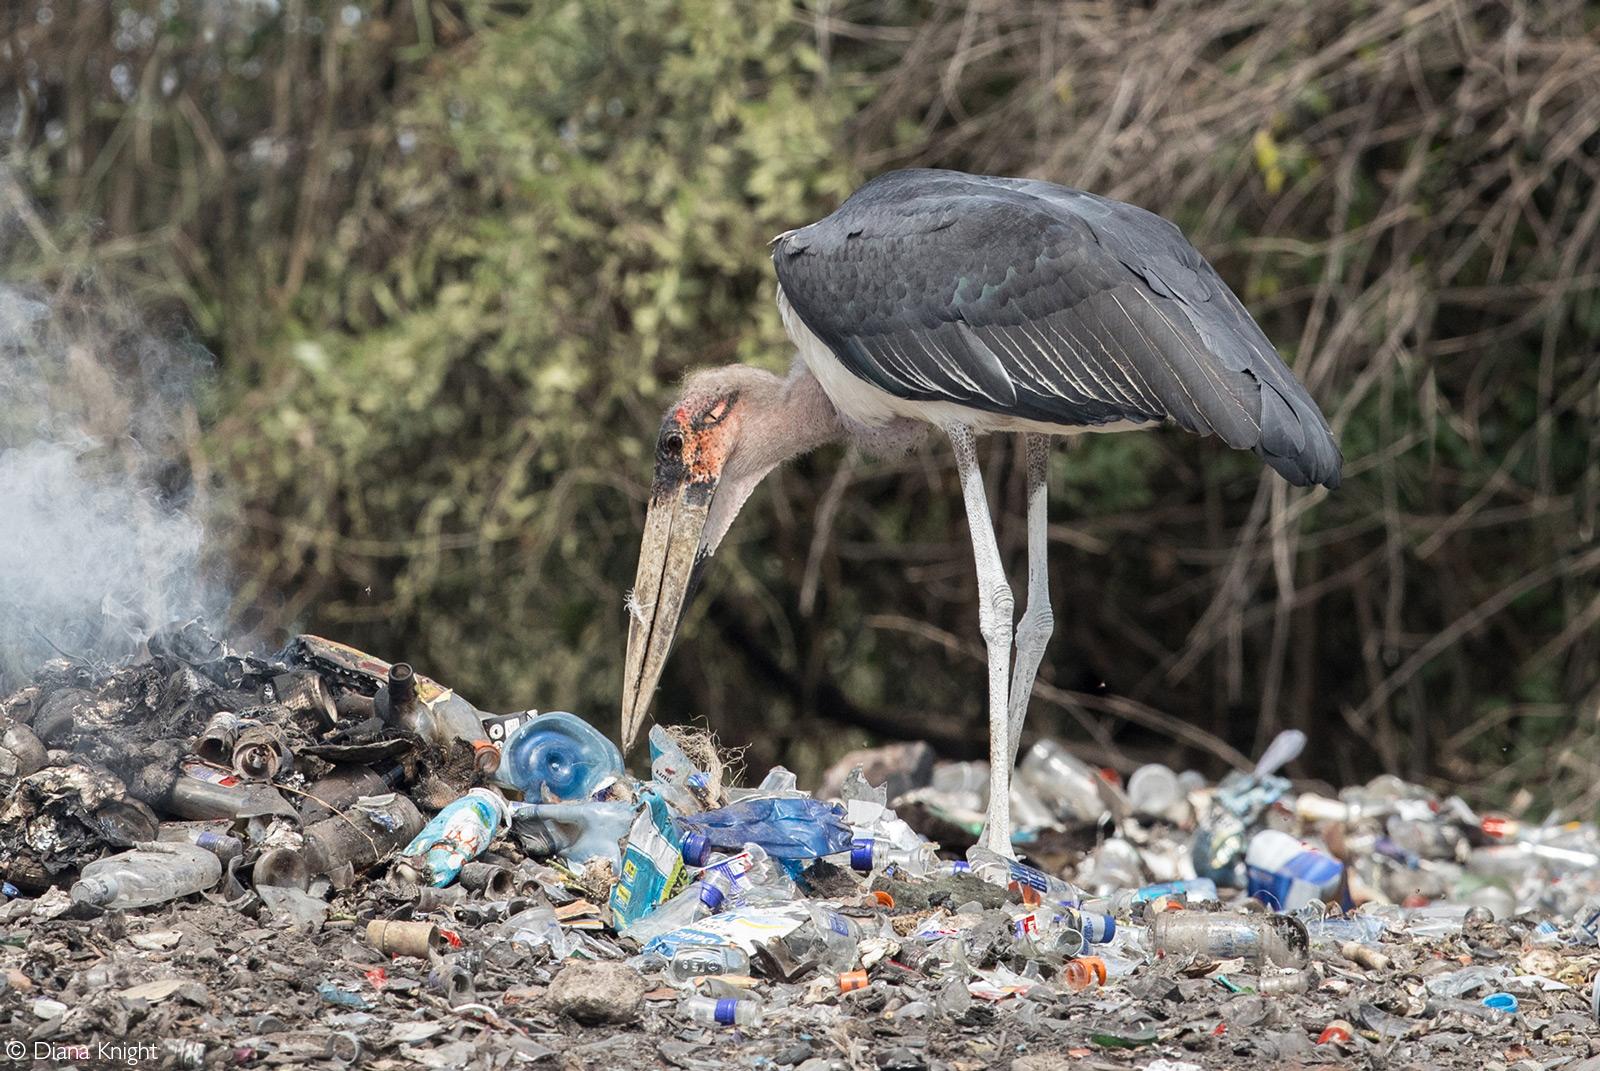 A marabou stork scavenges at a rubbish tip. Talek, Kenya © Diana Knight